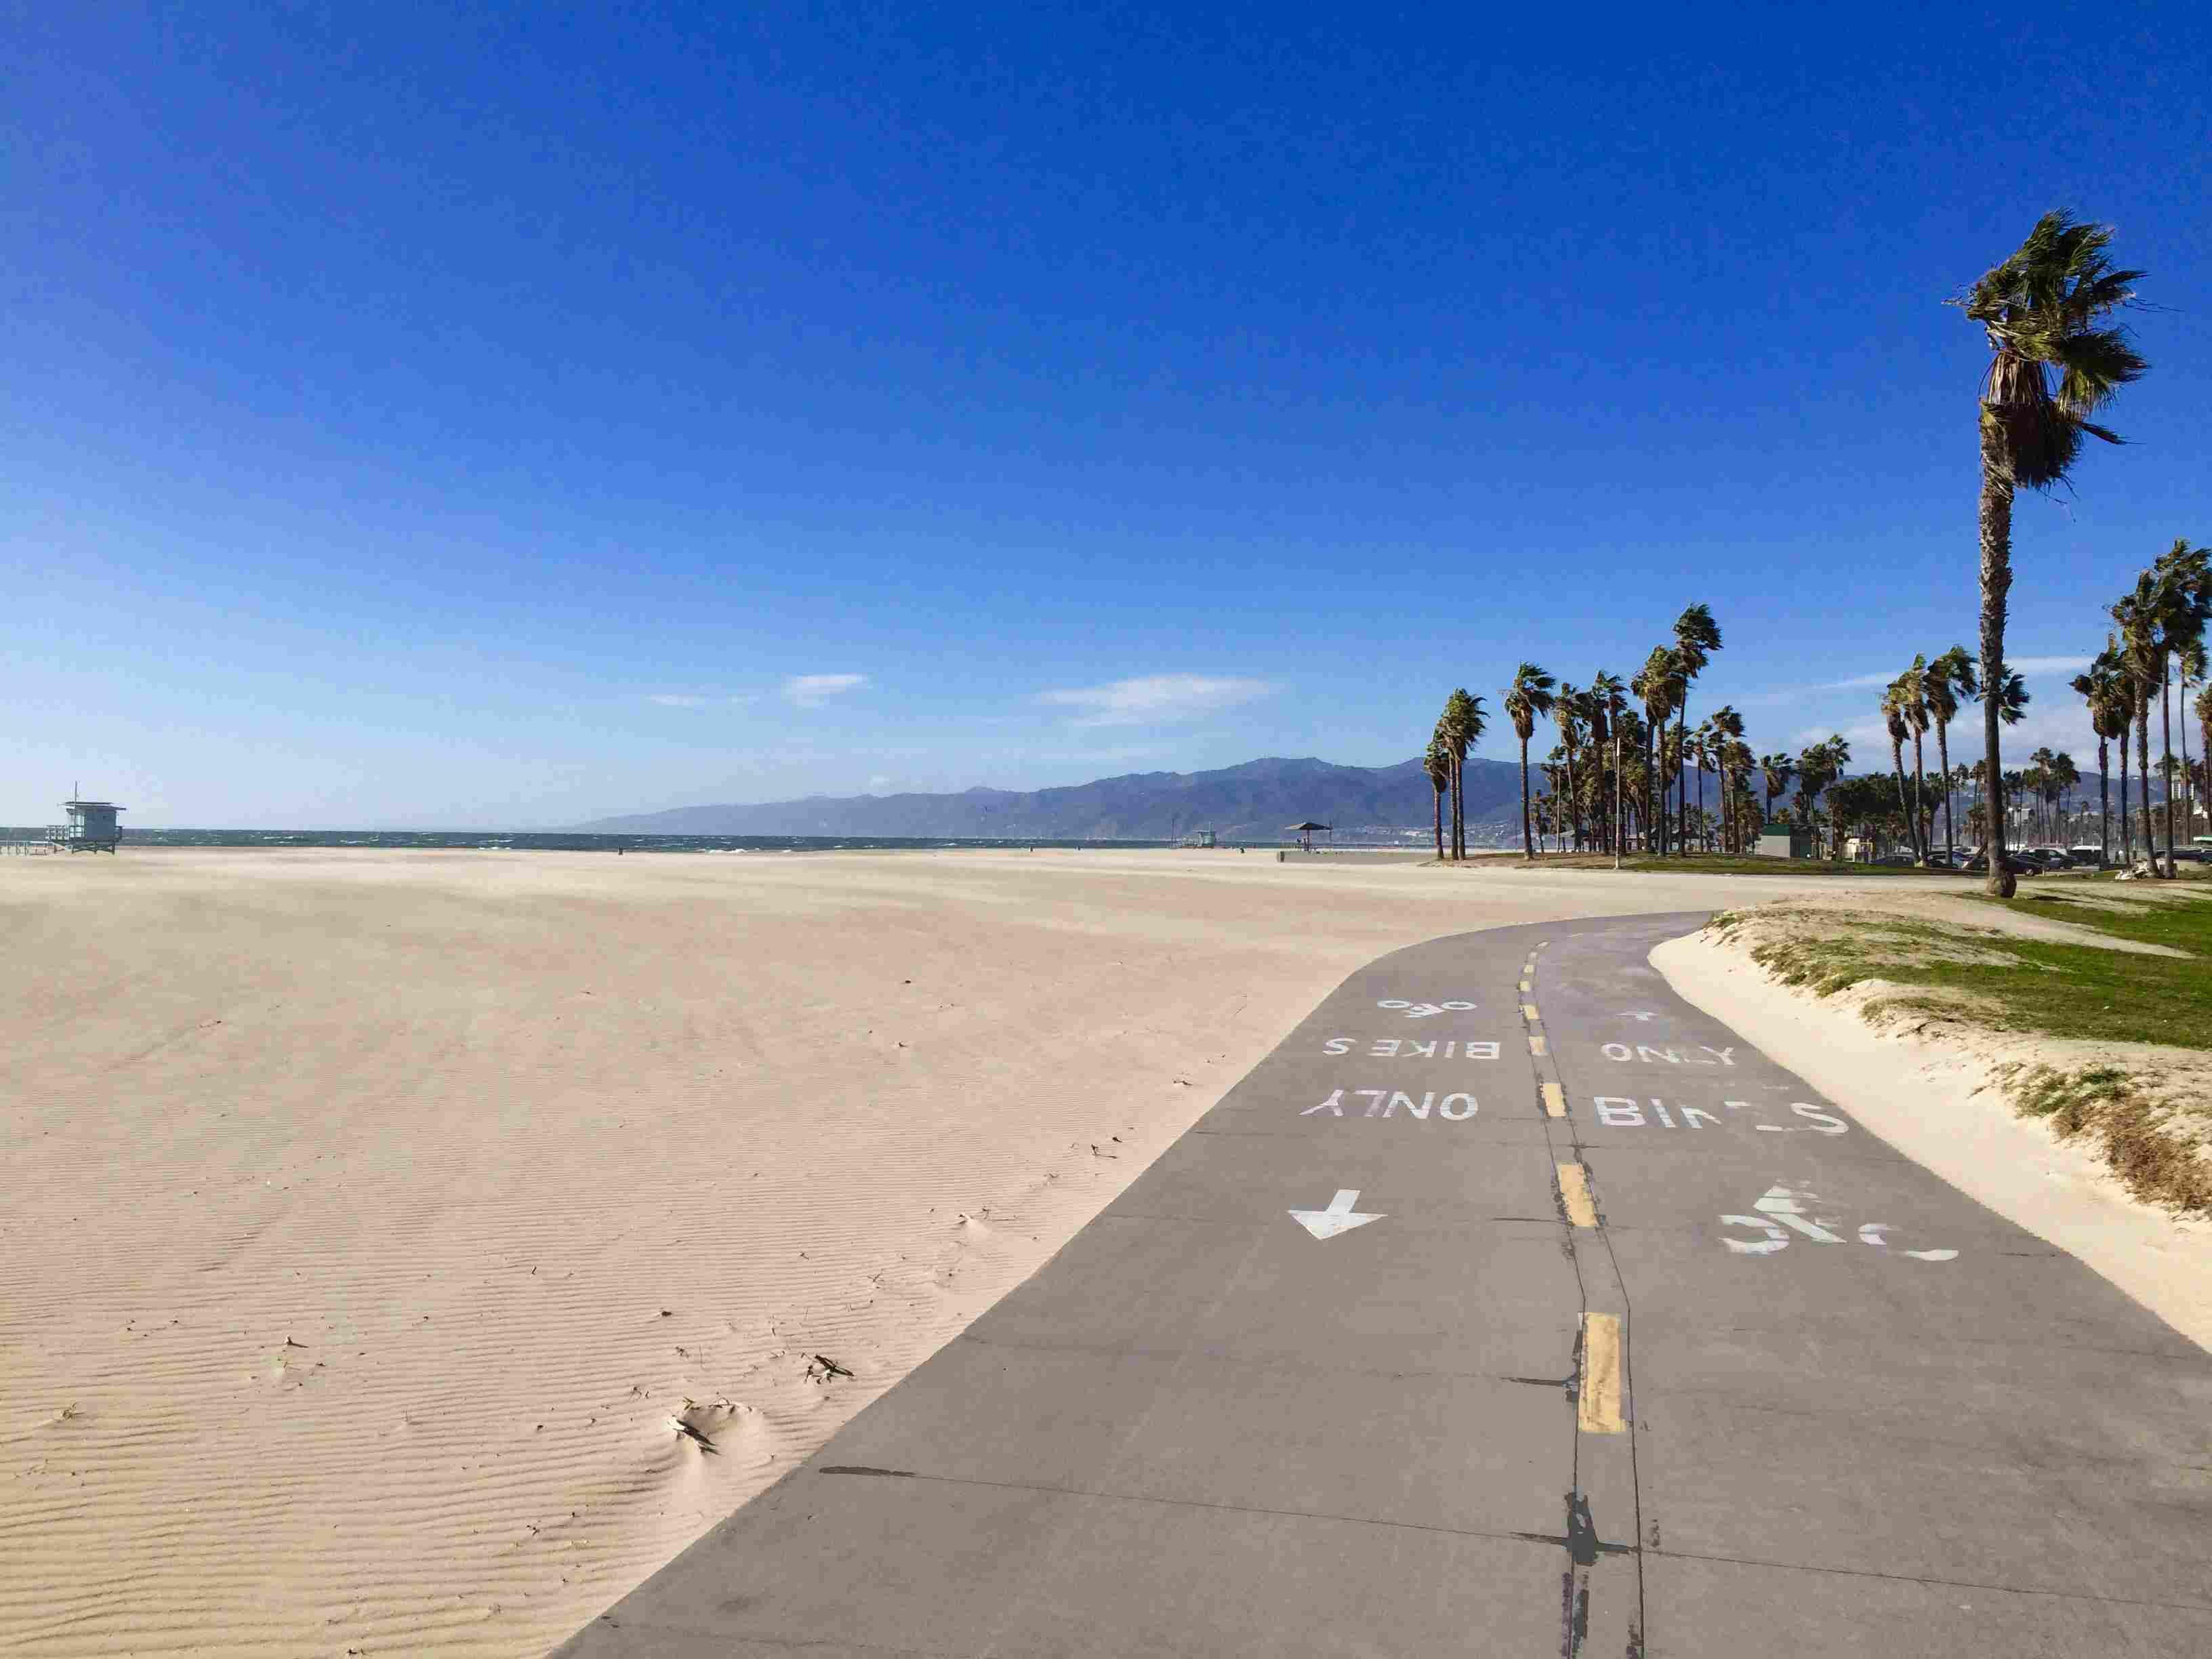 Venice Beach (Los Angeles County), California Bike Path